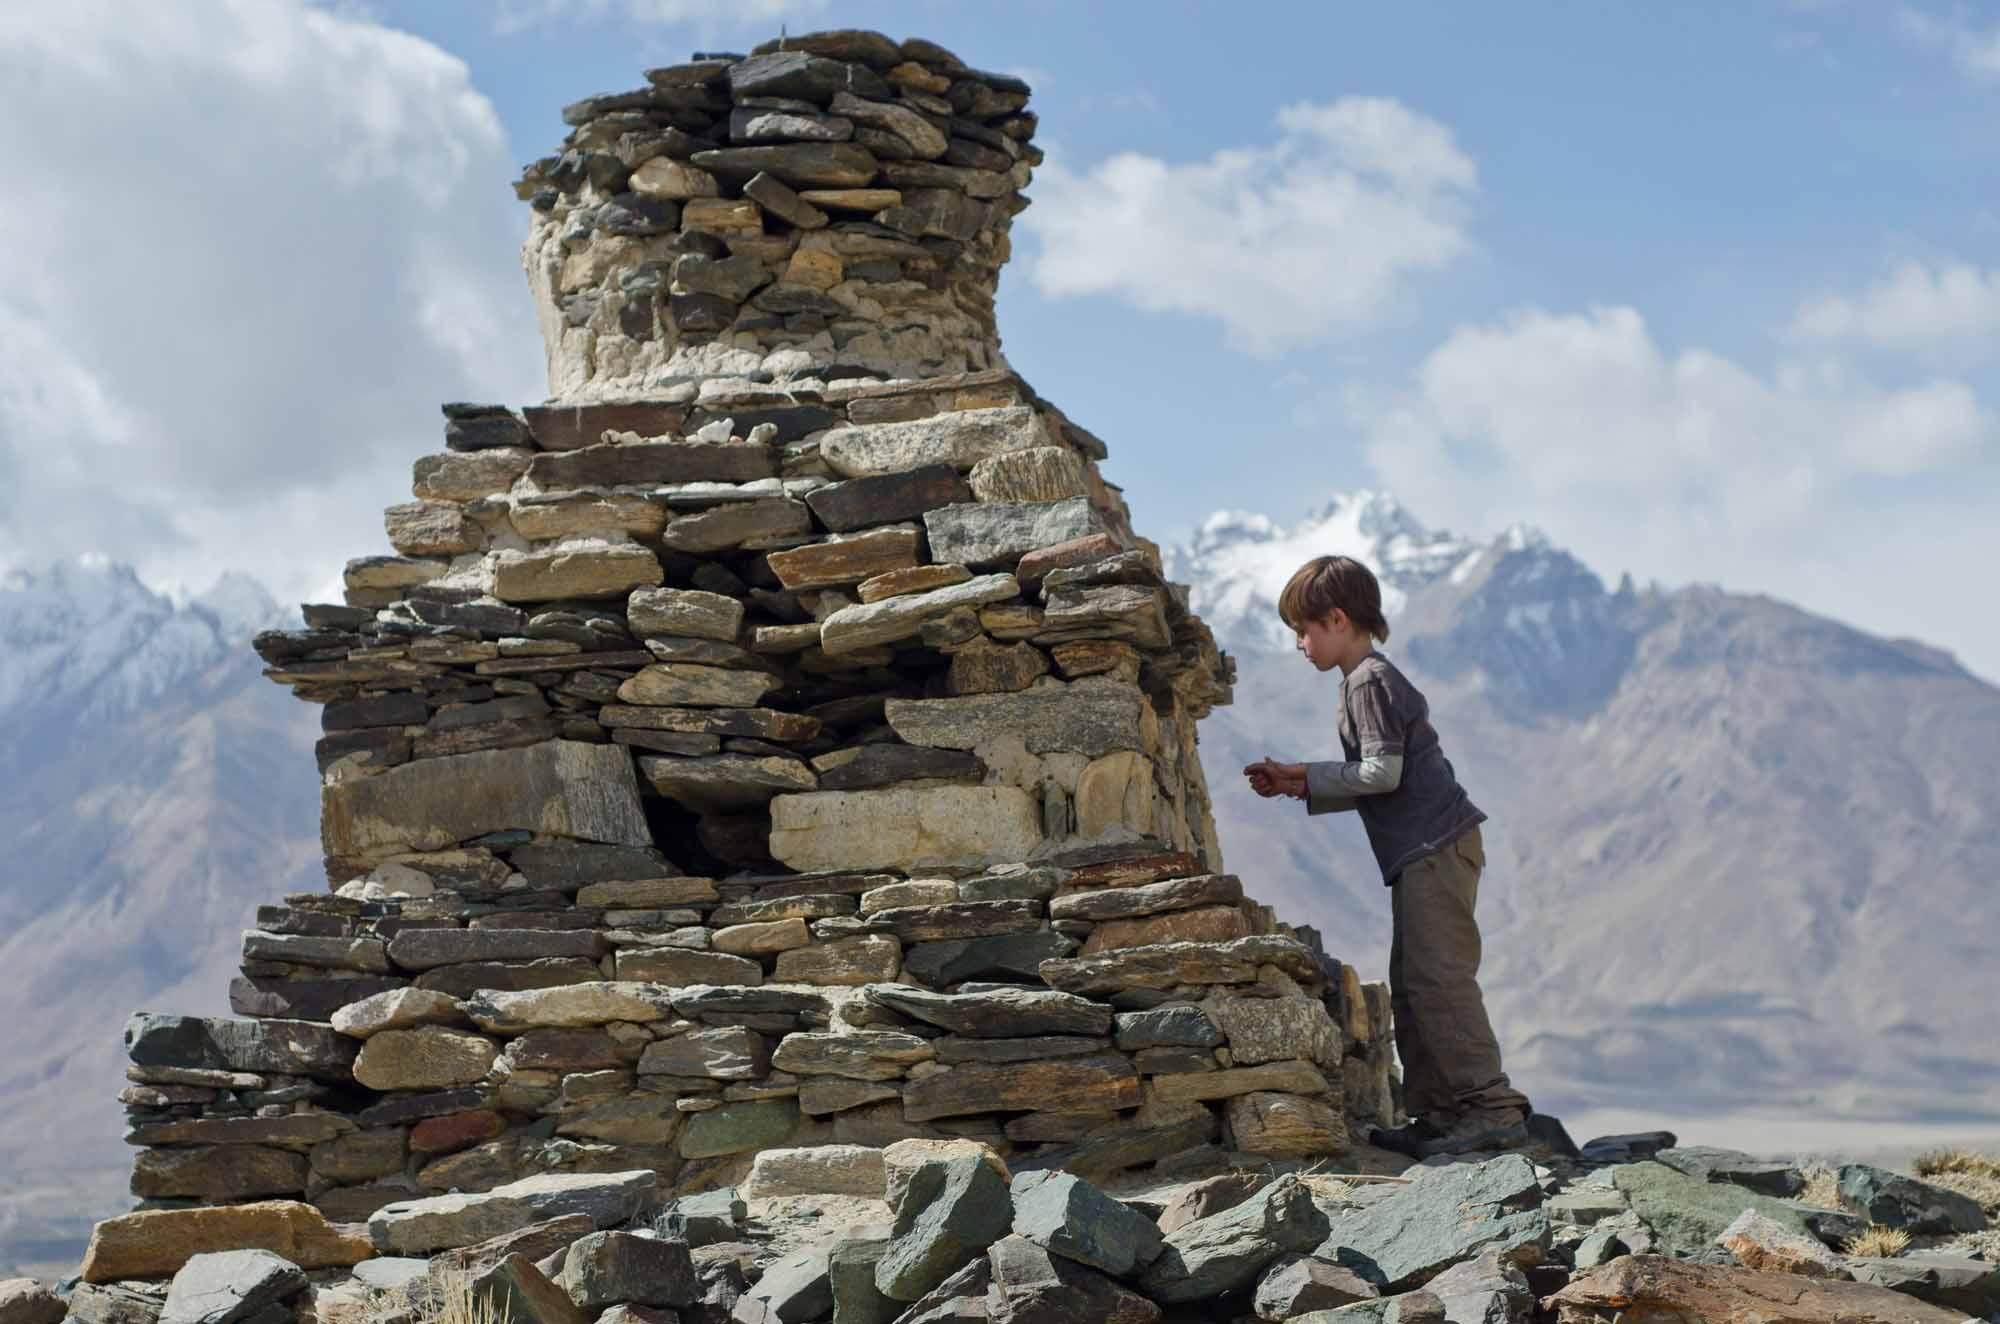 Blue-Sky-Kingdom-Family-Vacation-to-a-Buddhist-Monastery-KarshaGompa-Bruce-Kirkby-rock-stack